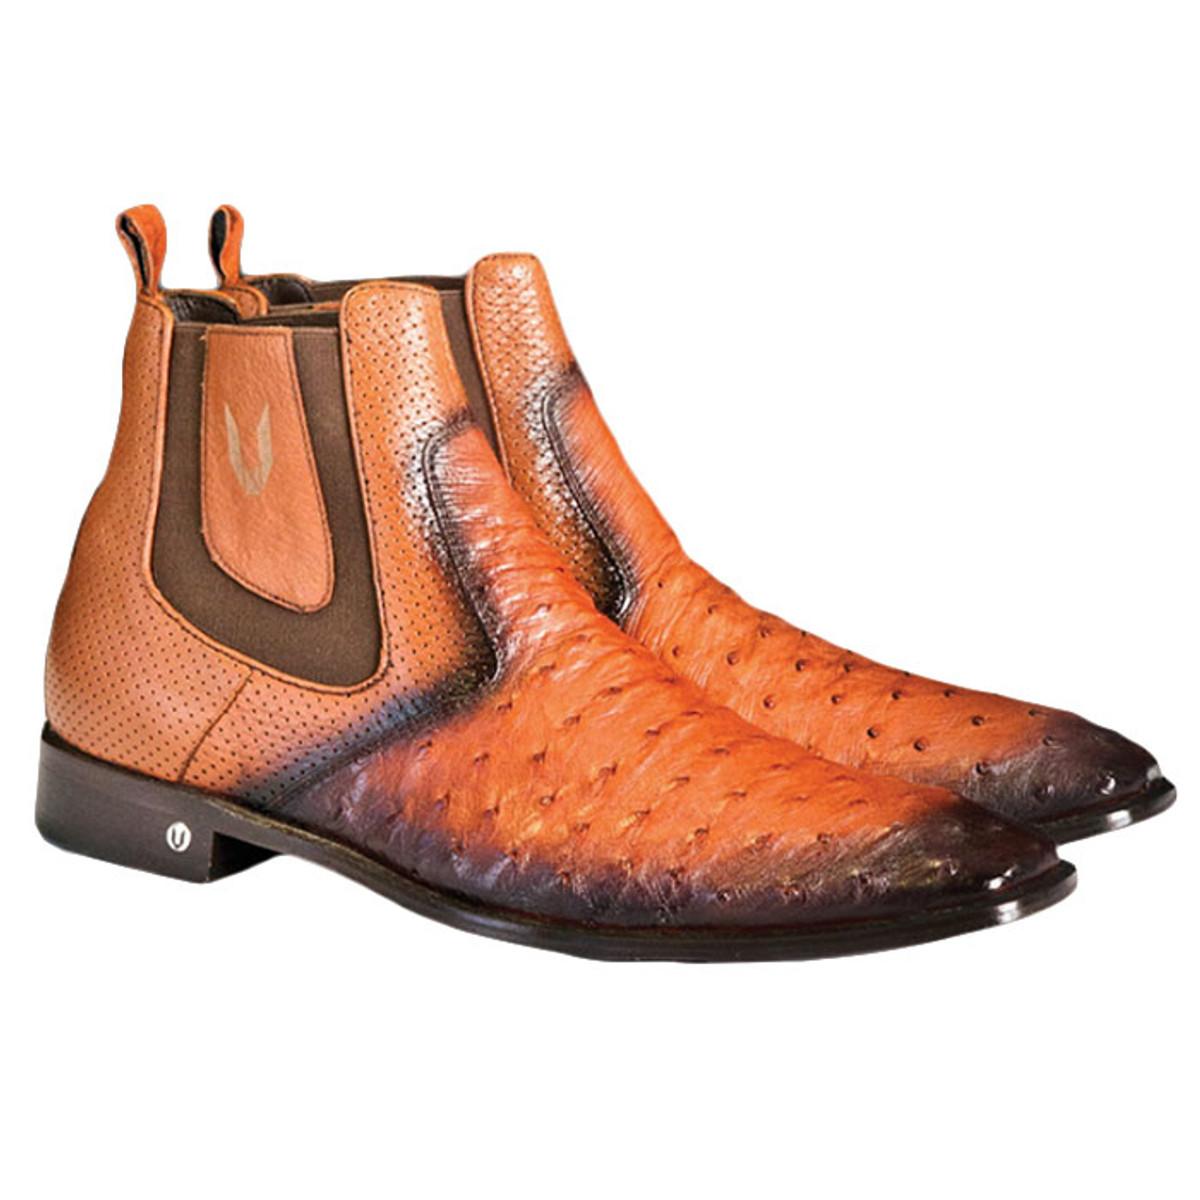 Mens's Faded Cognac Ostrich Chelsea Boot Vestigium 7BV010303F